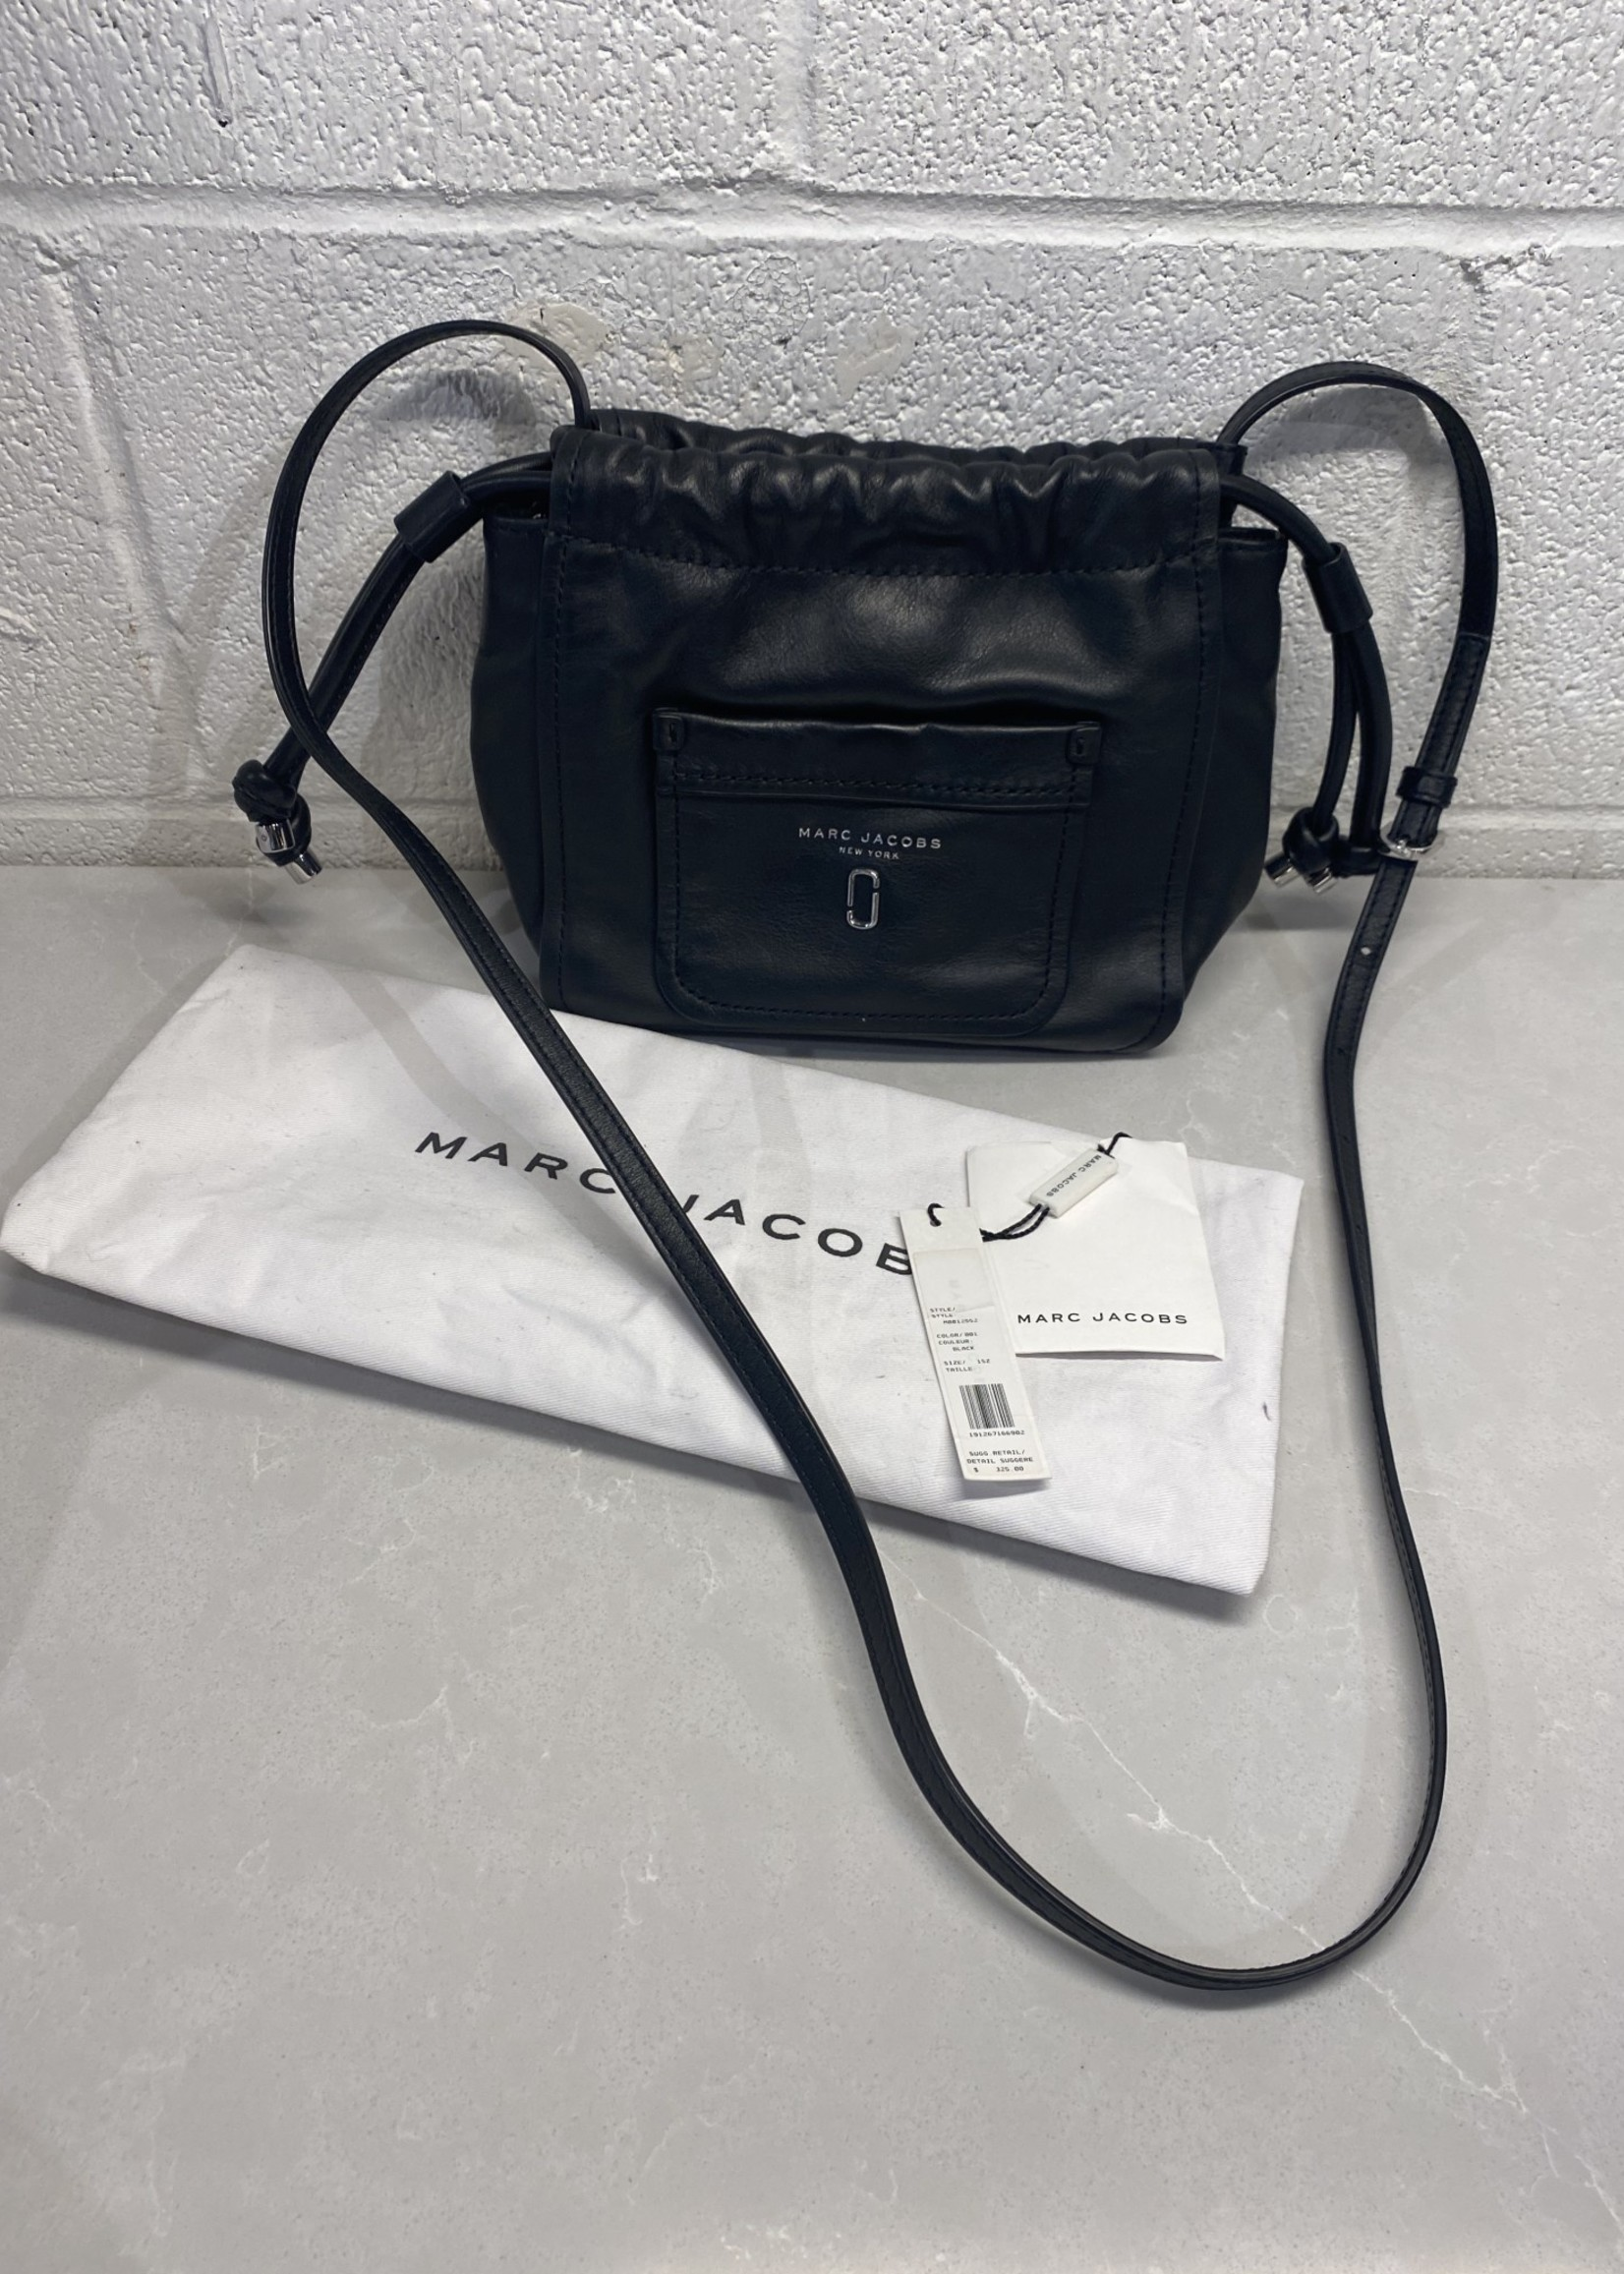 Marc Jacobs Black Cinch Bag (Retail $325)